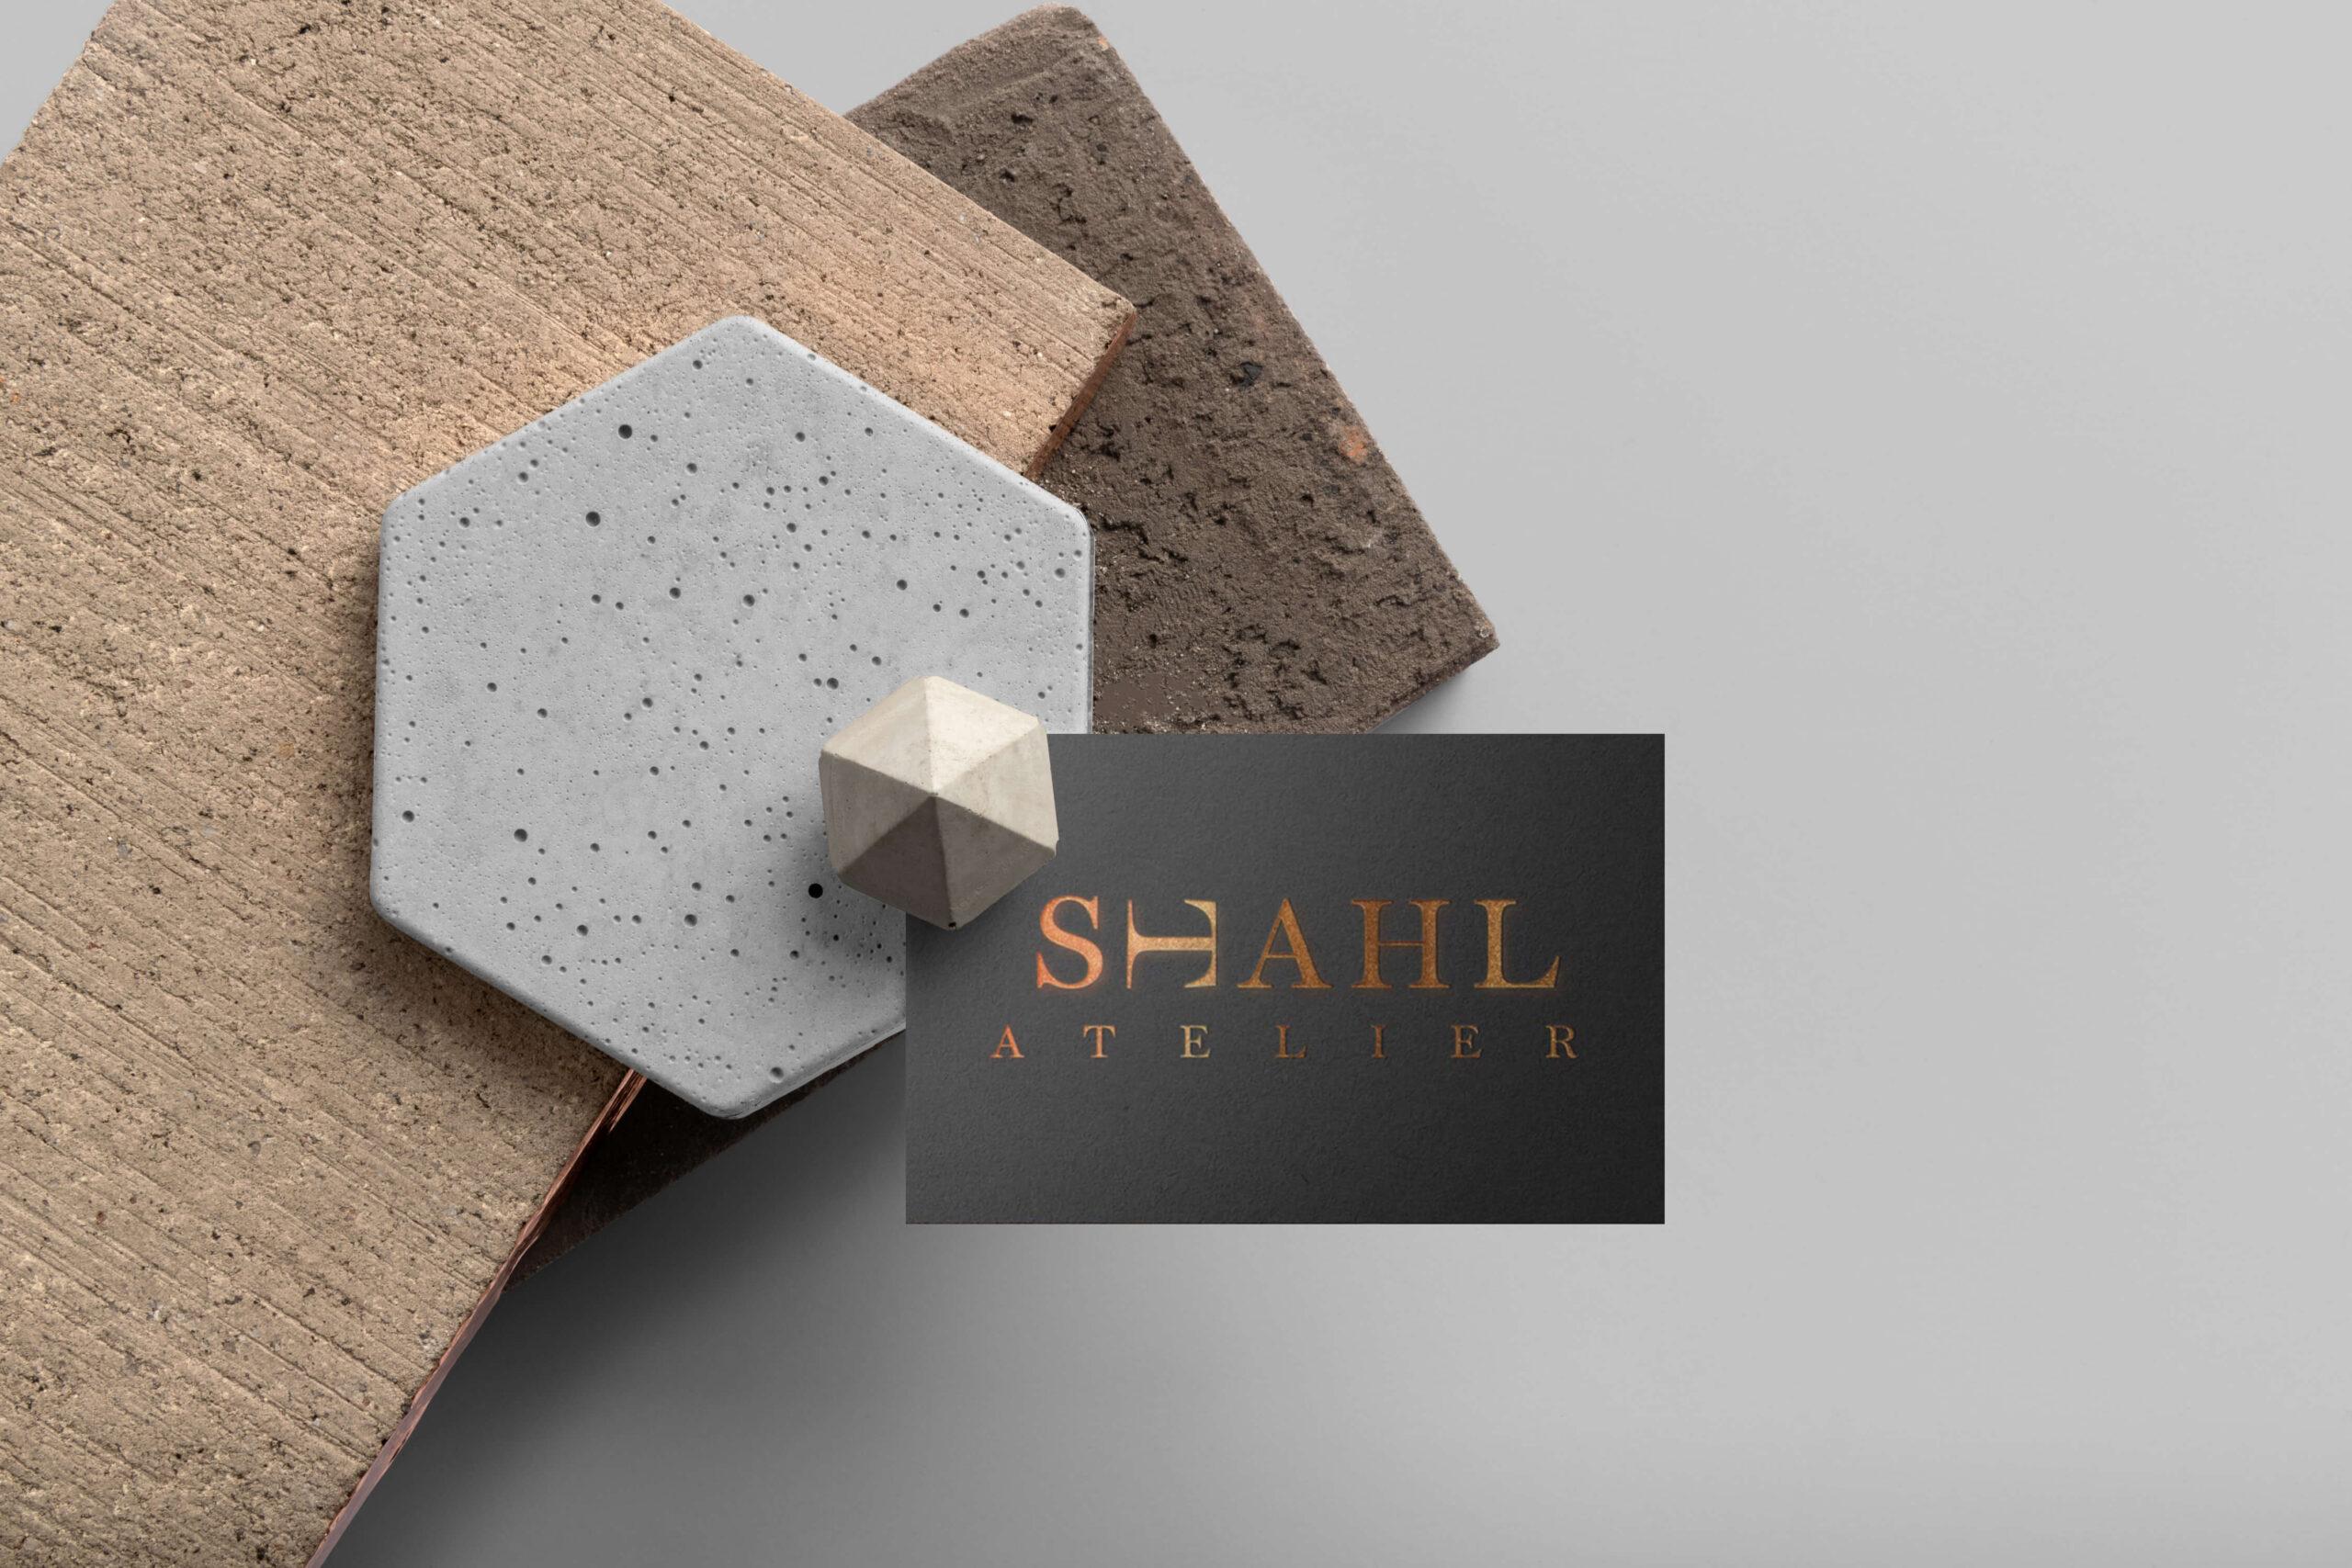 sade creative agency - STAHL ATELIER